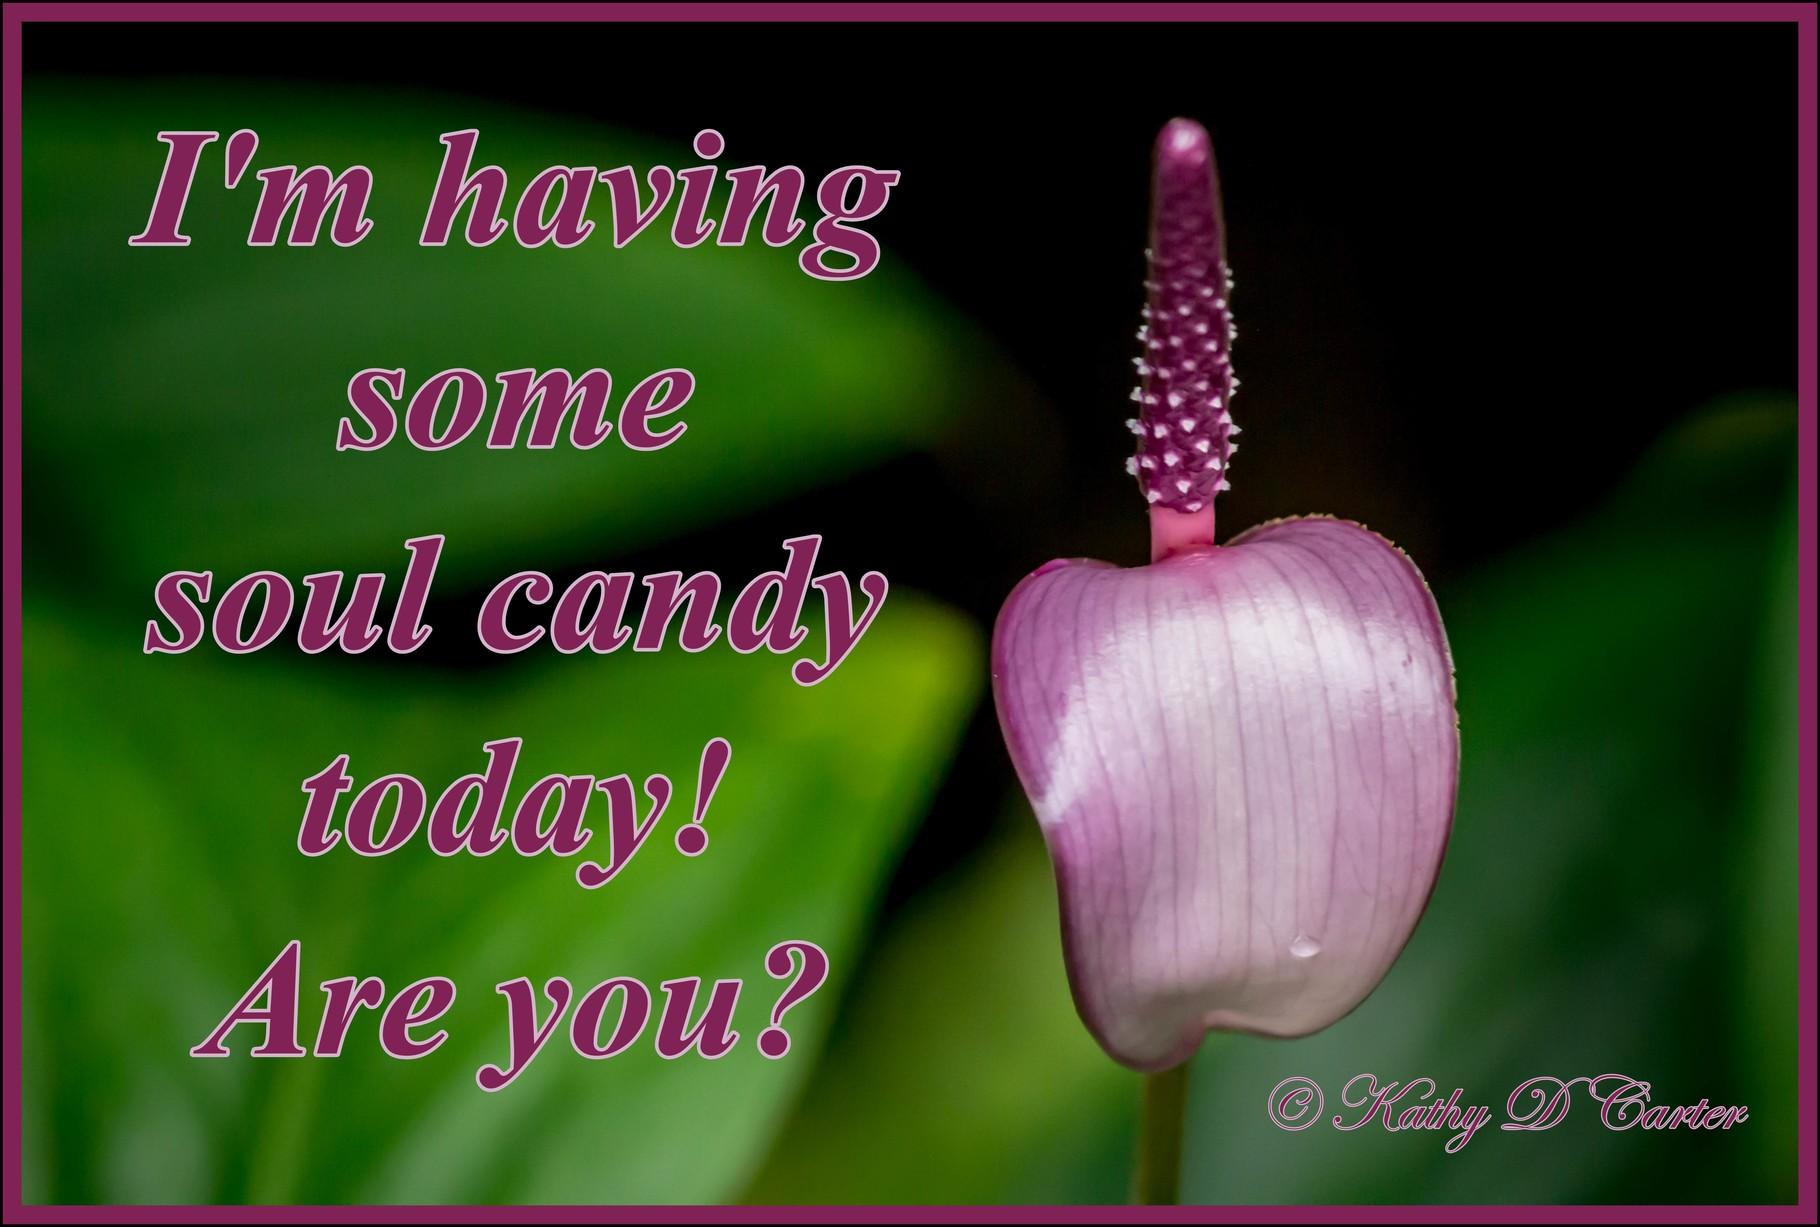 Enjoy some Soul Candy!